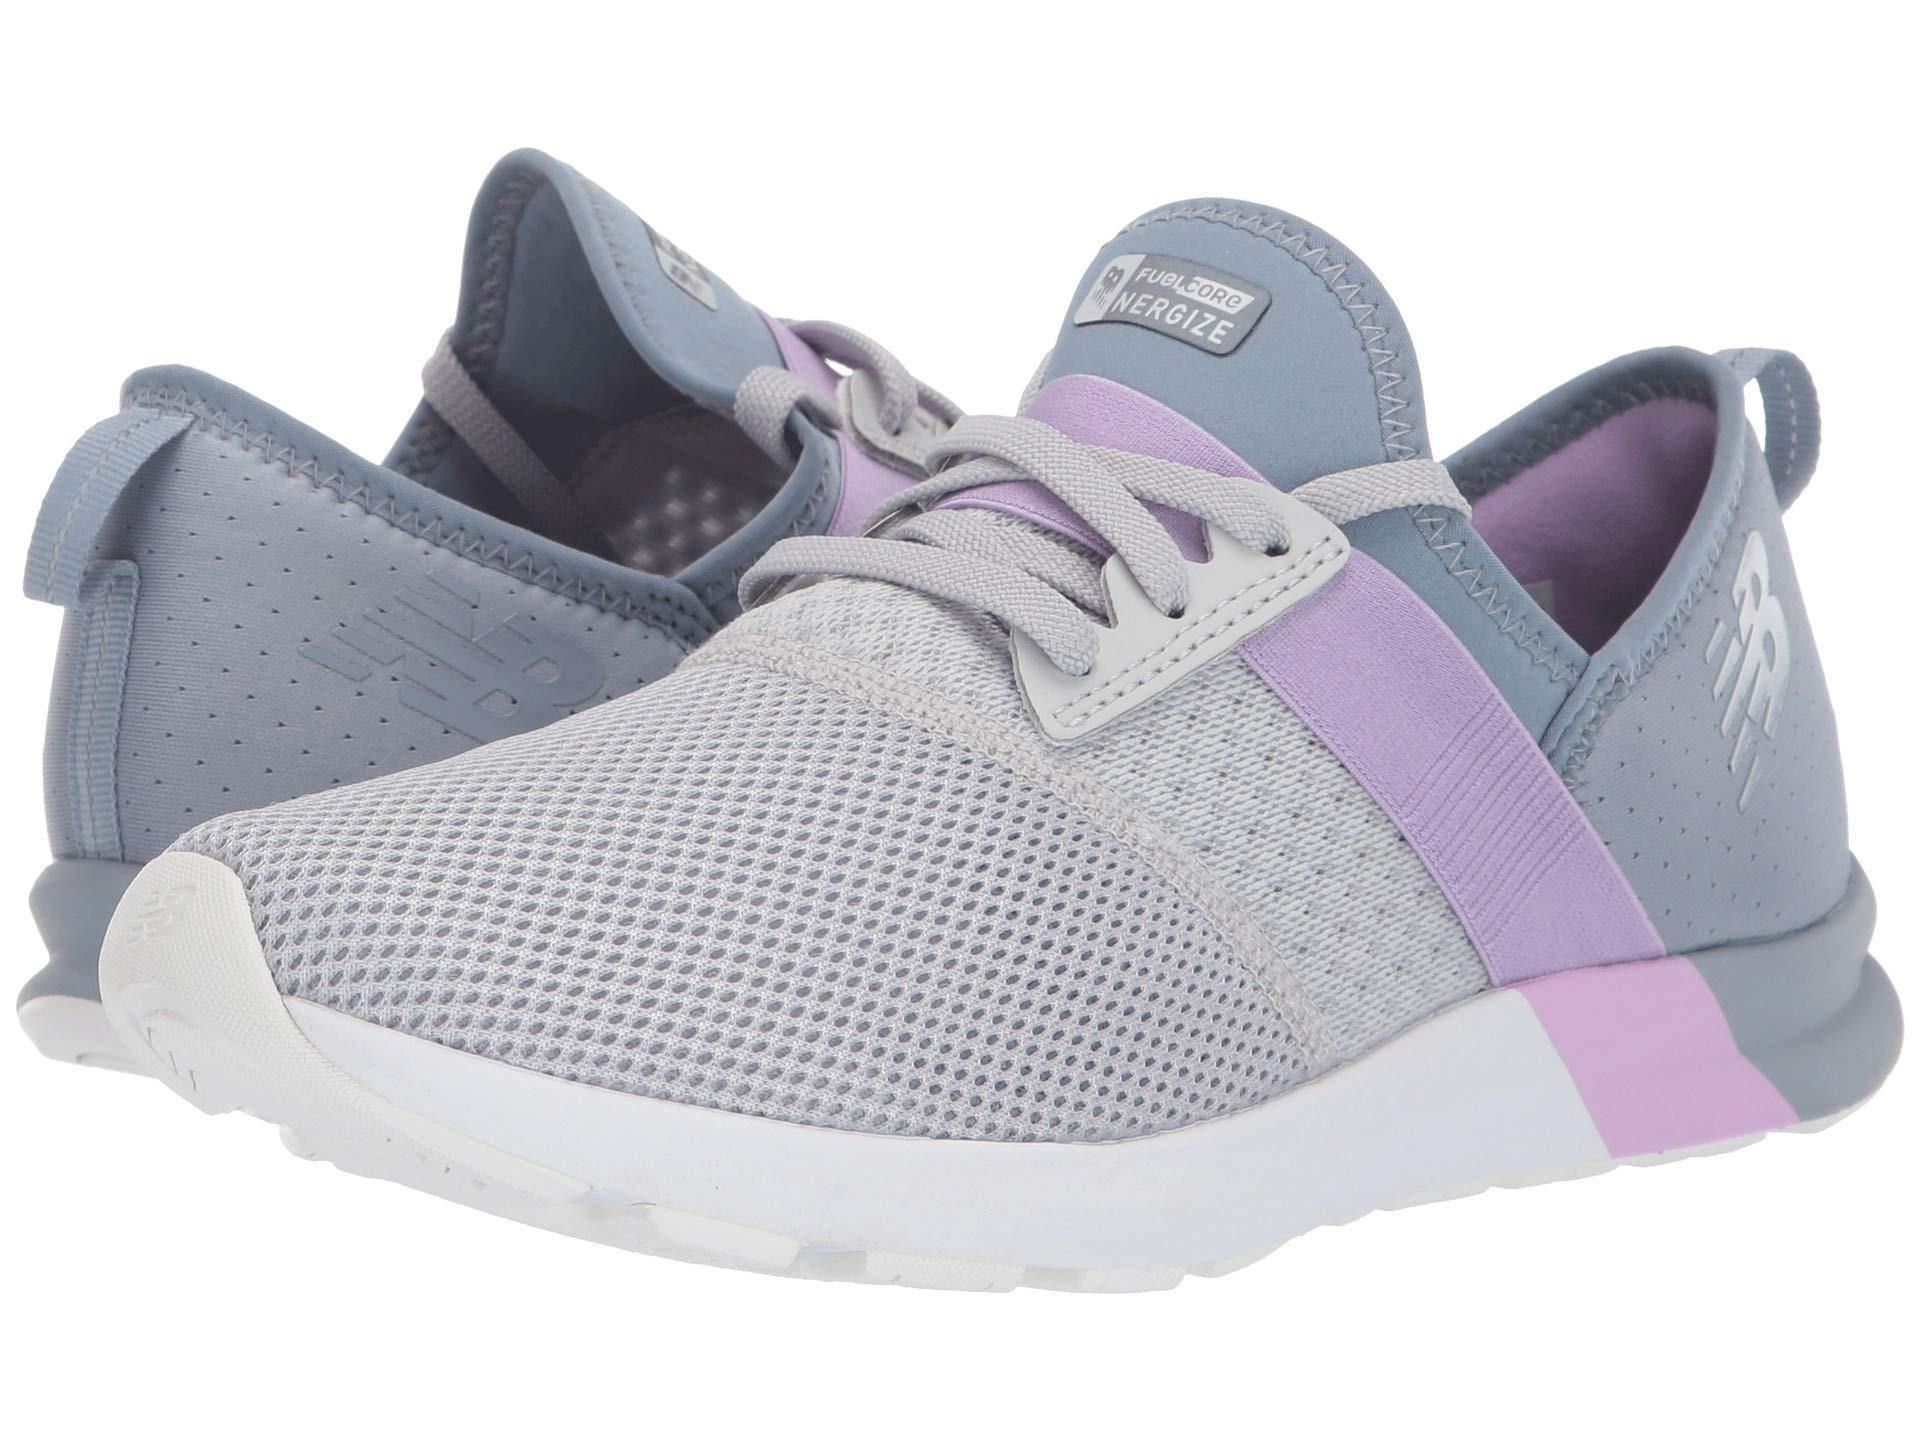 2a733ff0 Fuelcore Nergize (light Aluminum/reflection/dark Violet) Women's Cross  Training Shoes